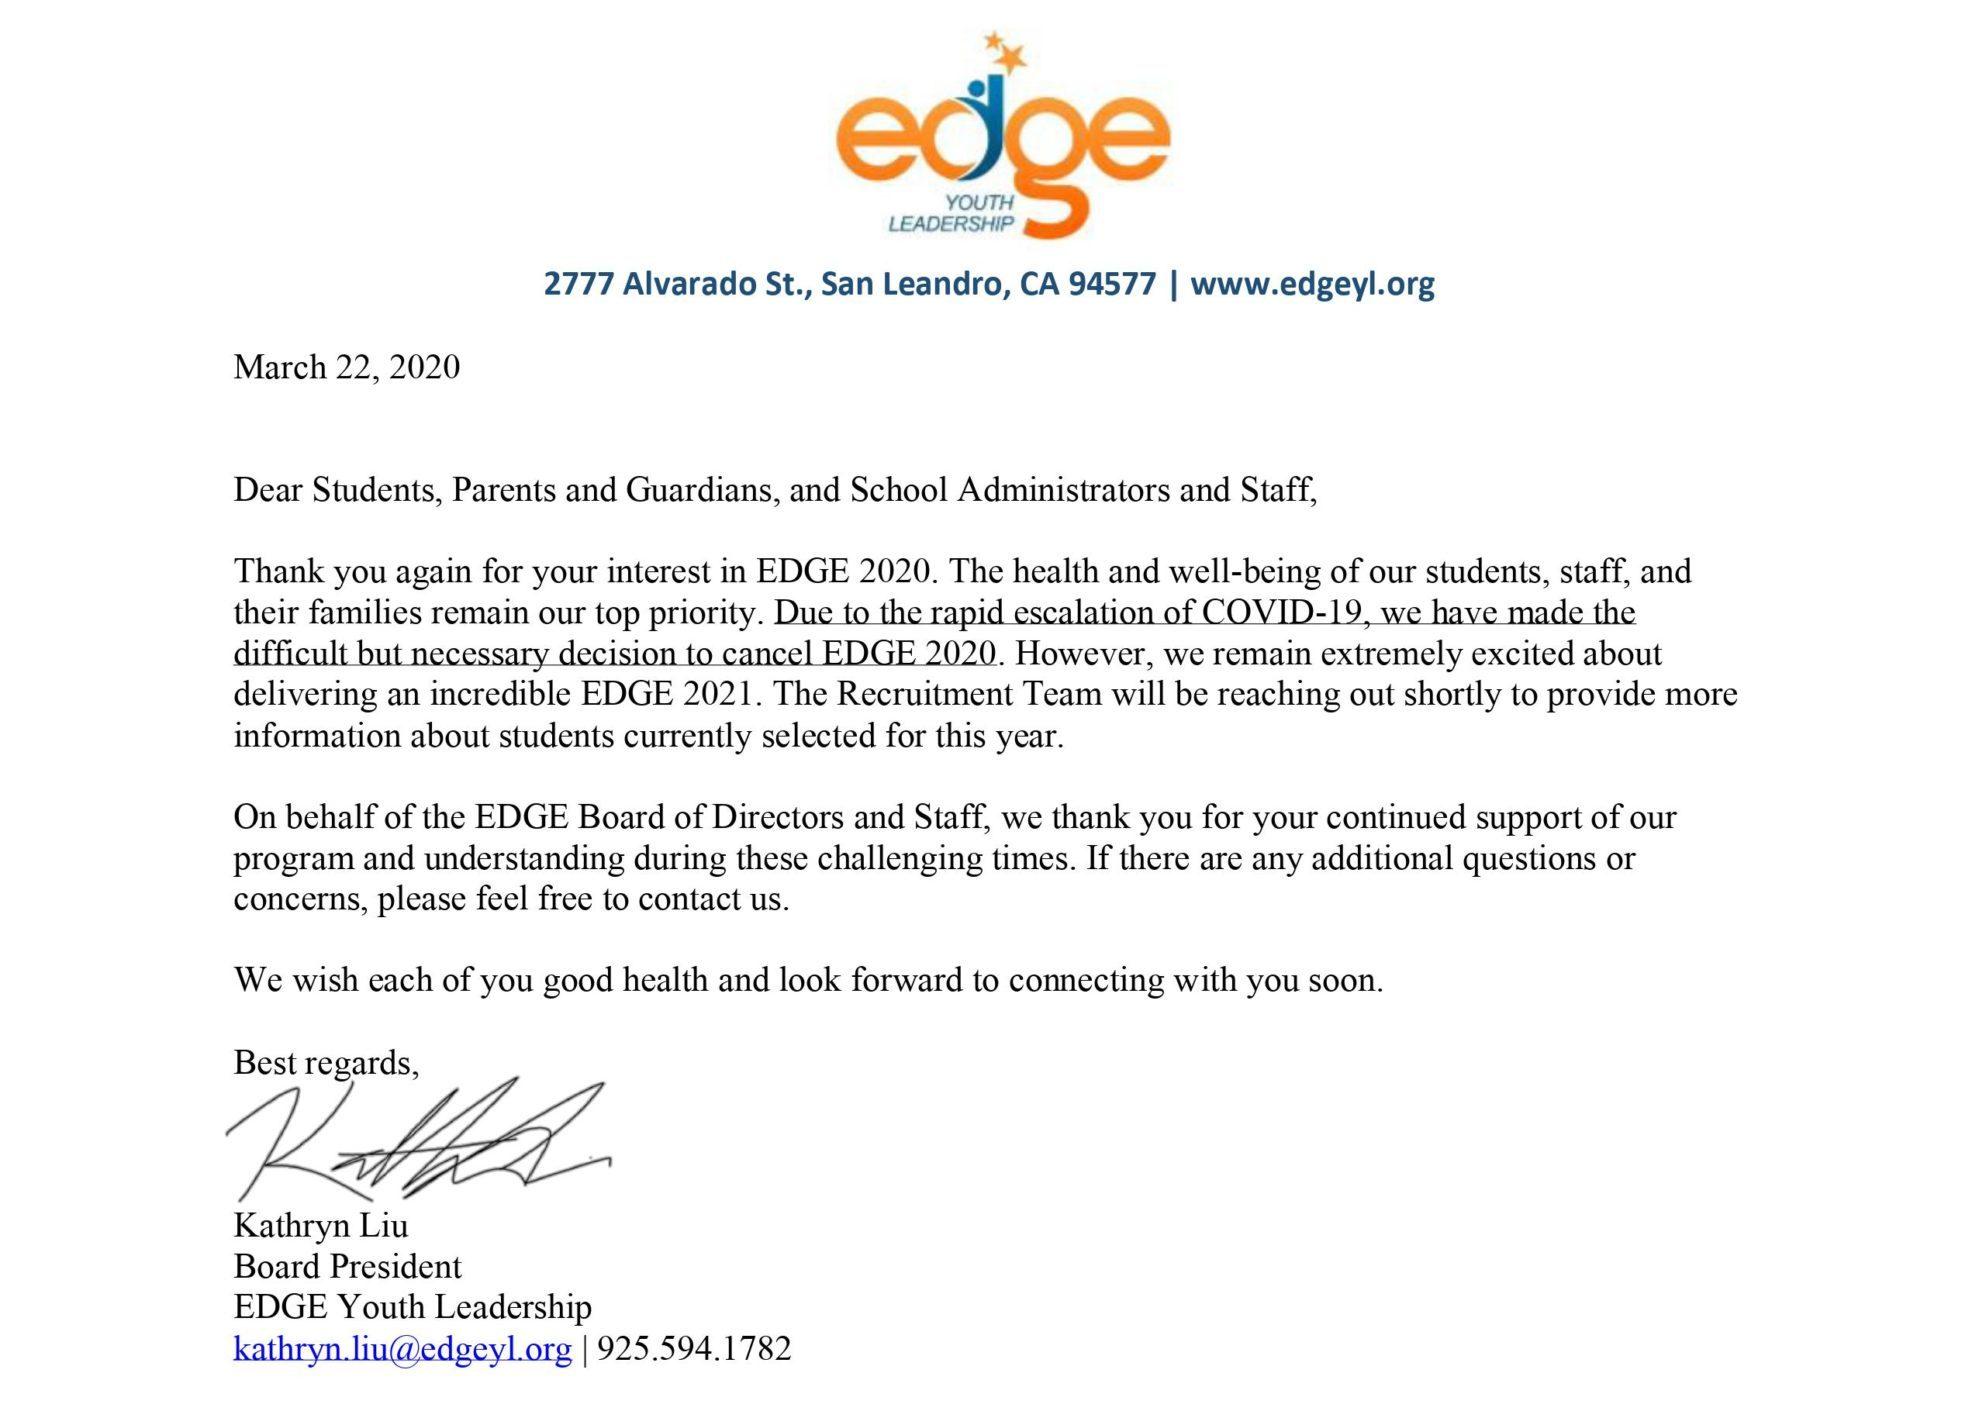 Board President Letter COVID 19